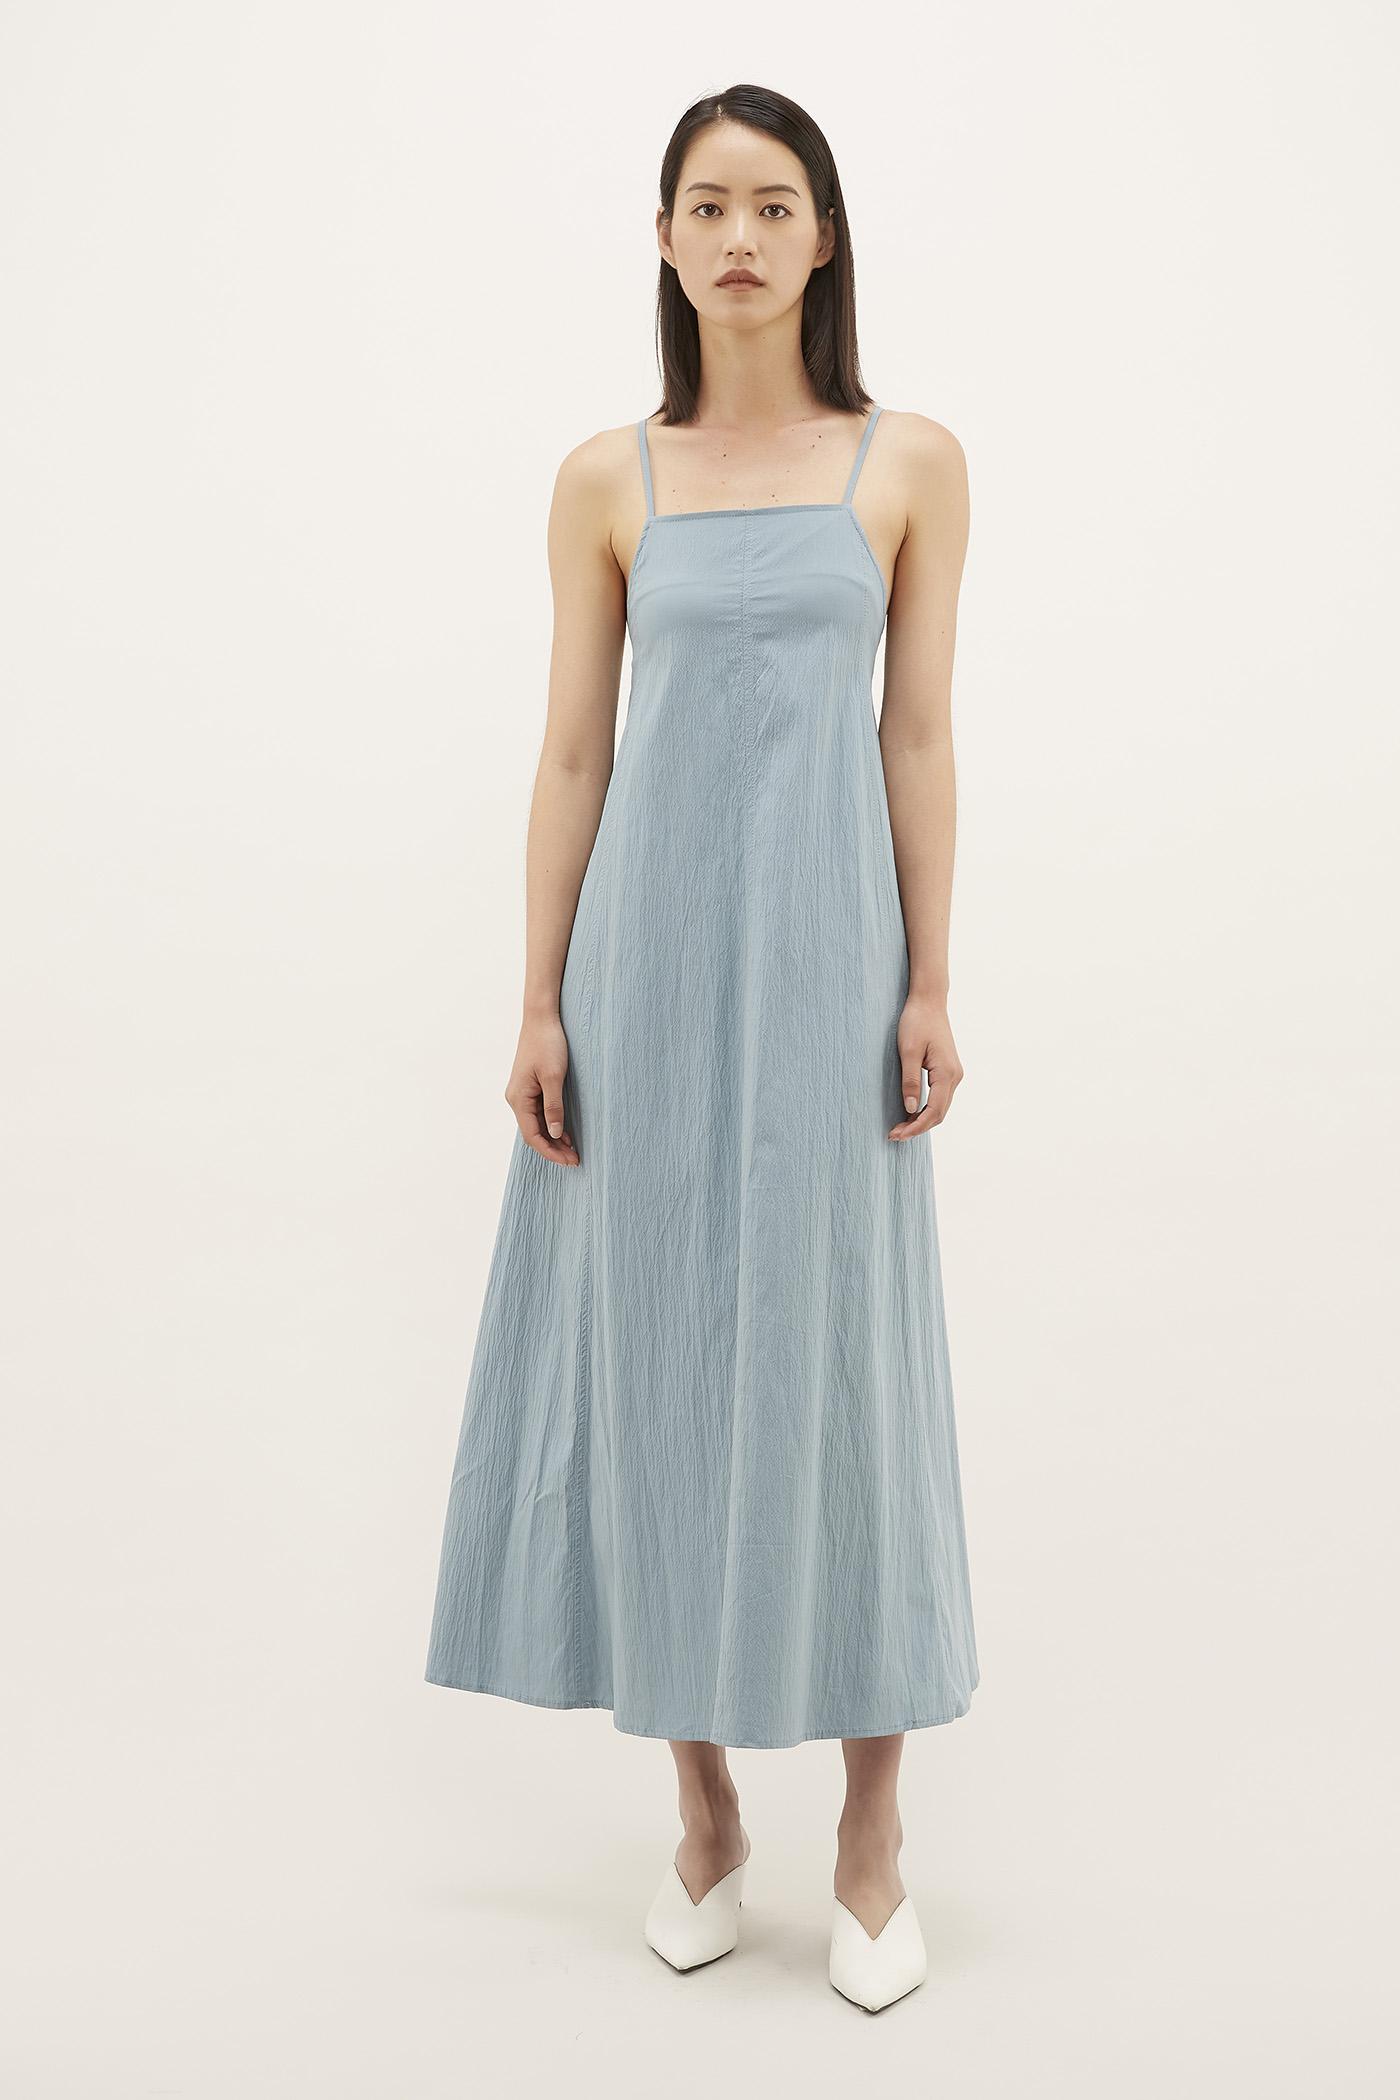 Alaisha Tent Dress